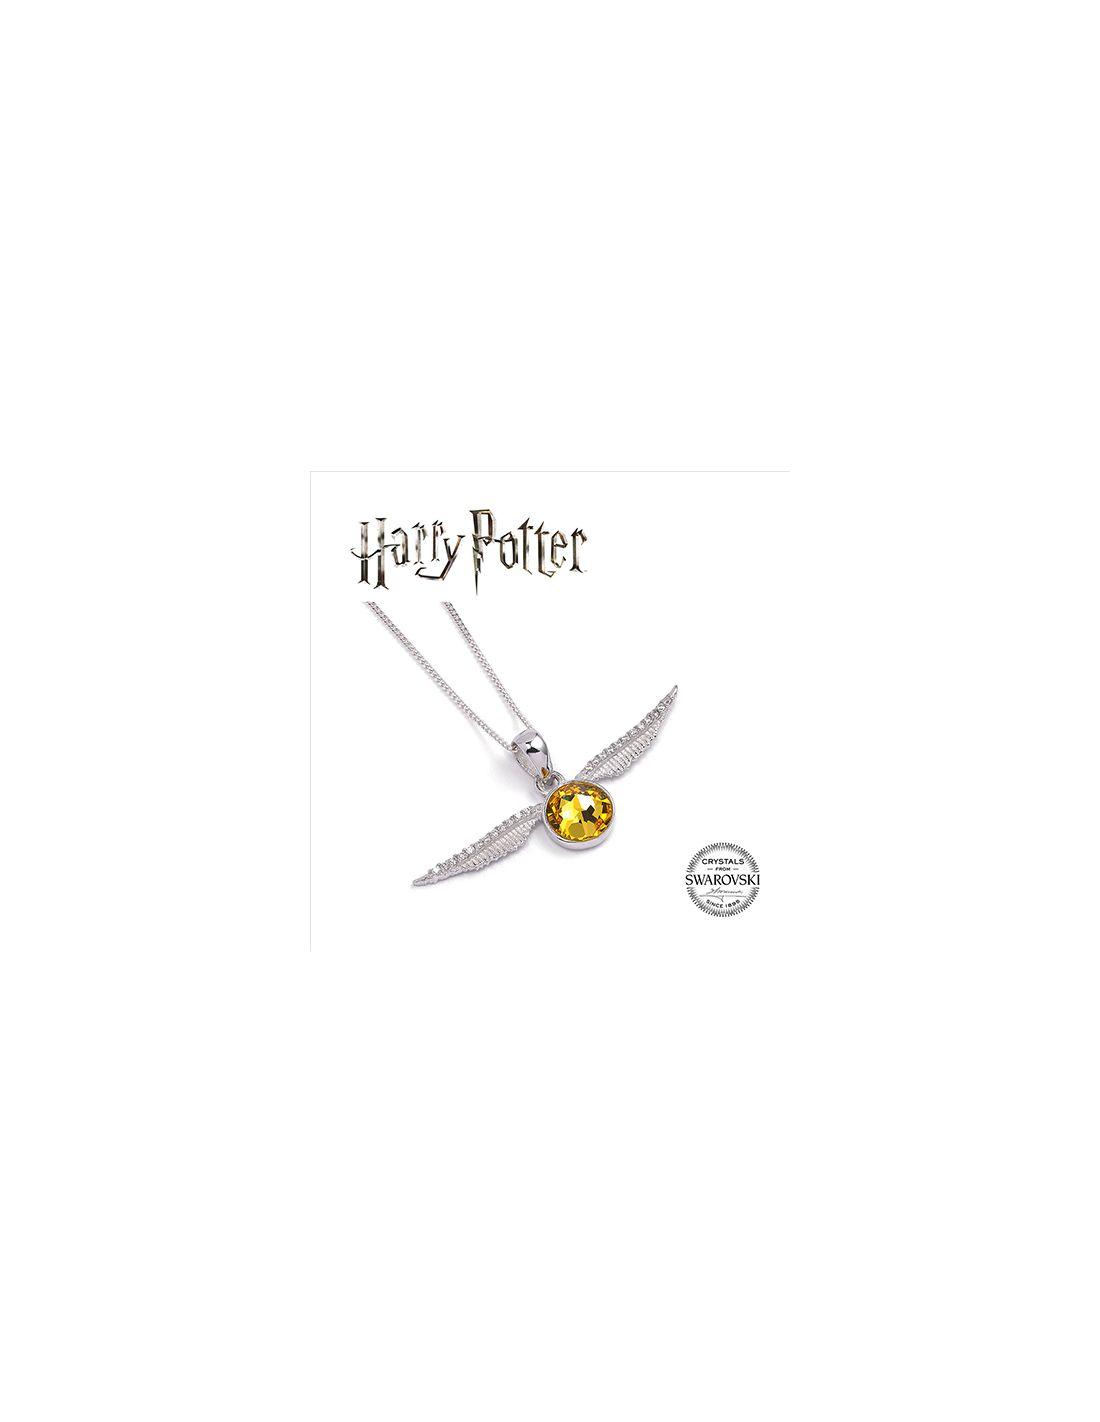 c72543e1eeb2 Colgante Snitch Dorada Plata y Swarovski - Harry Potter